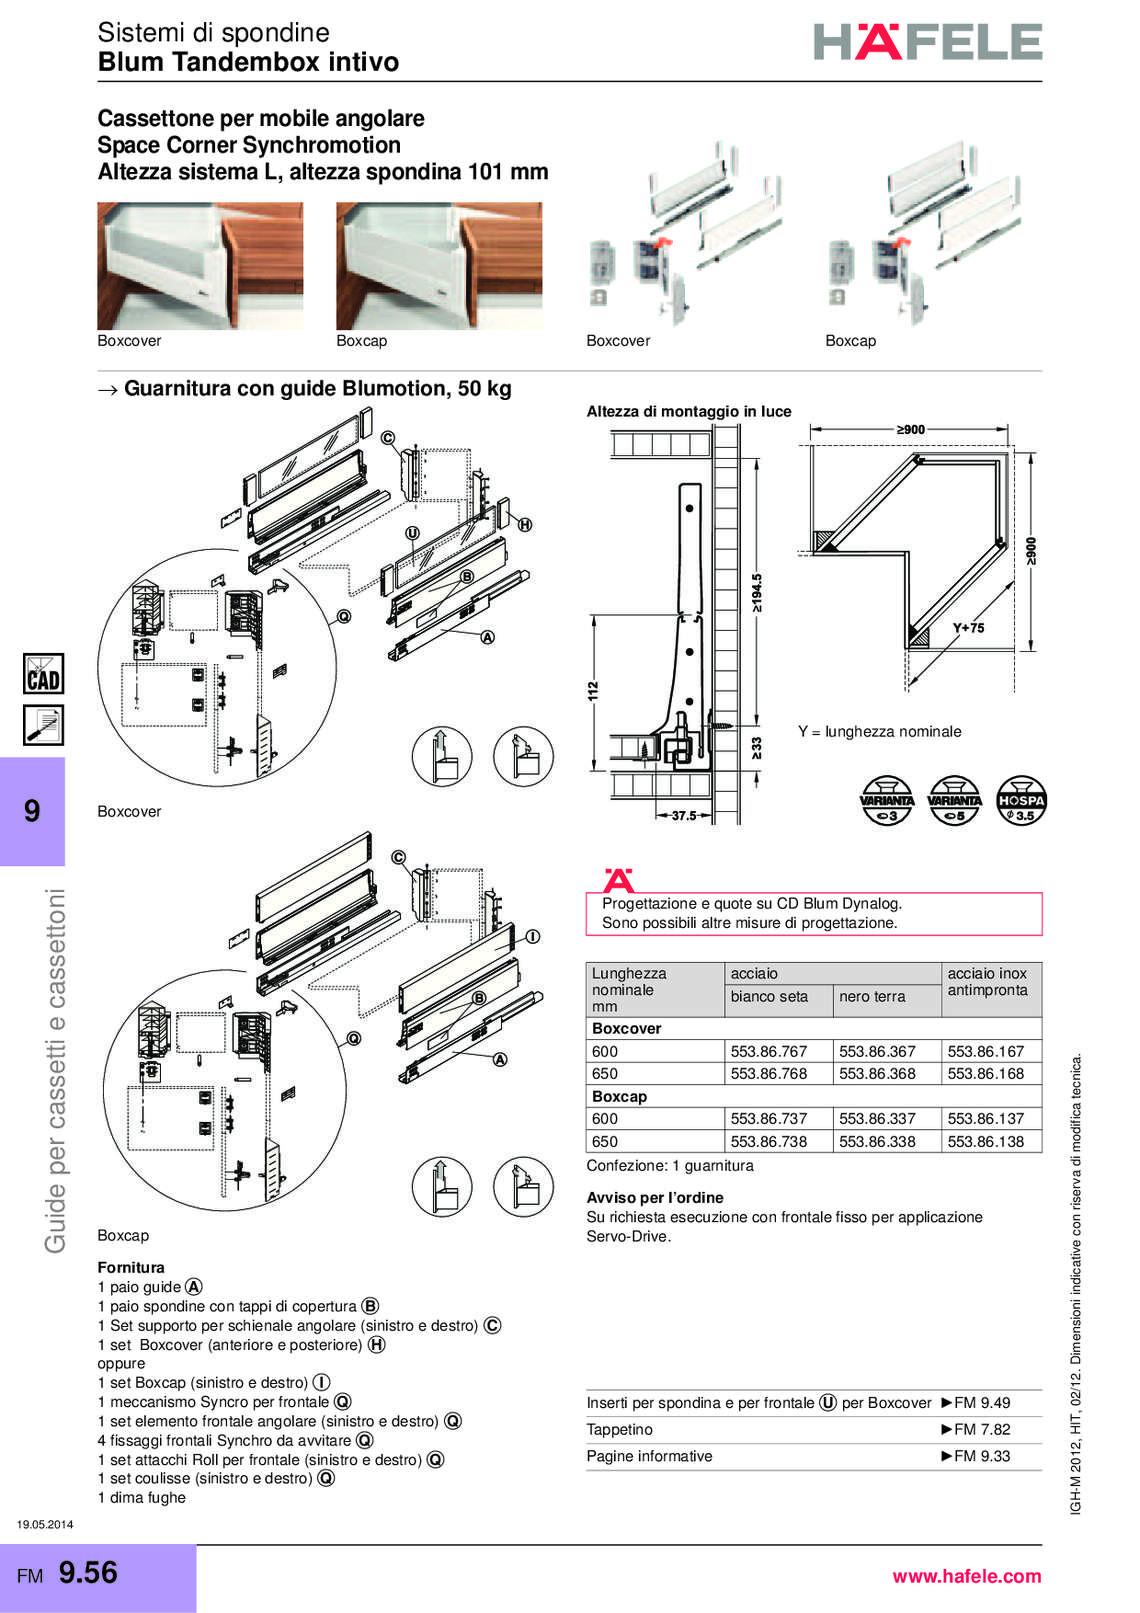 hafele-spondine-e-guide-per-mobili_40_069.jpg